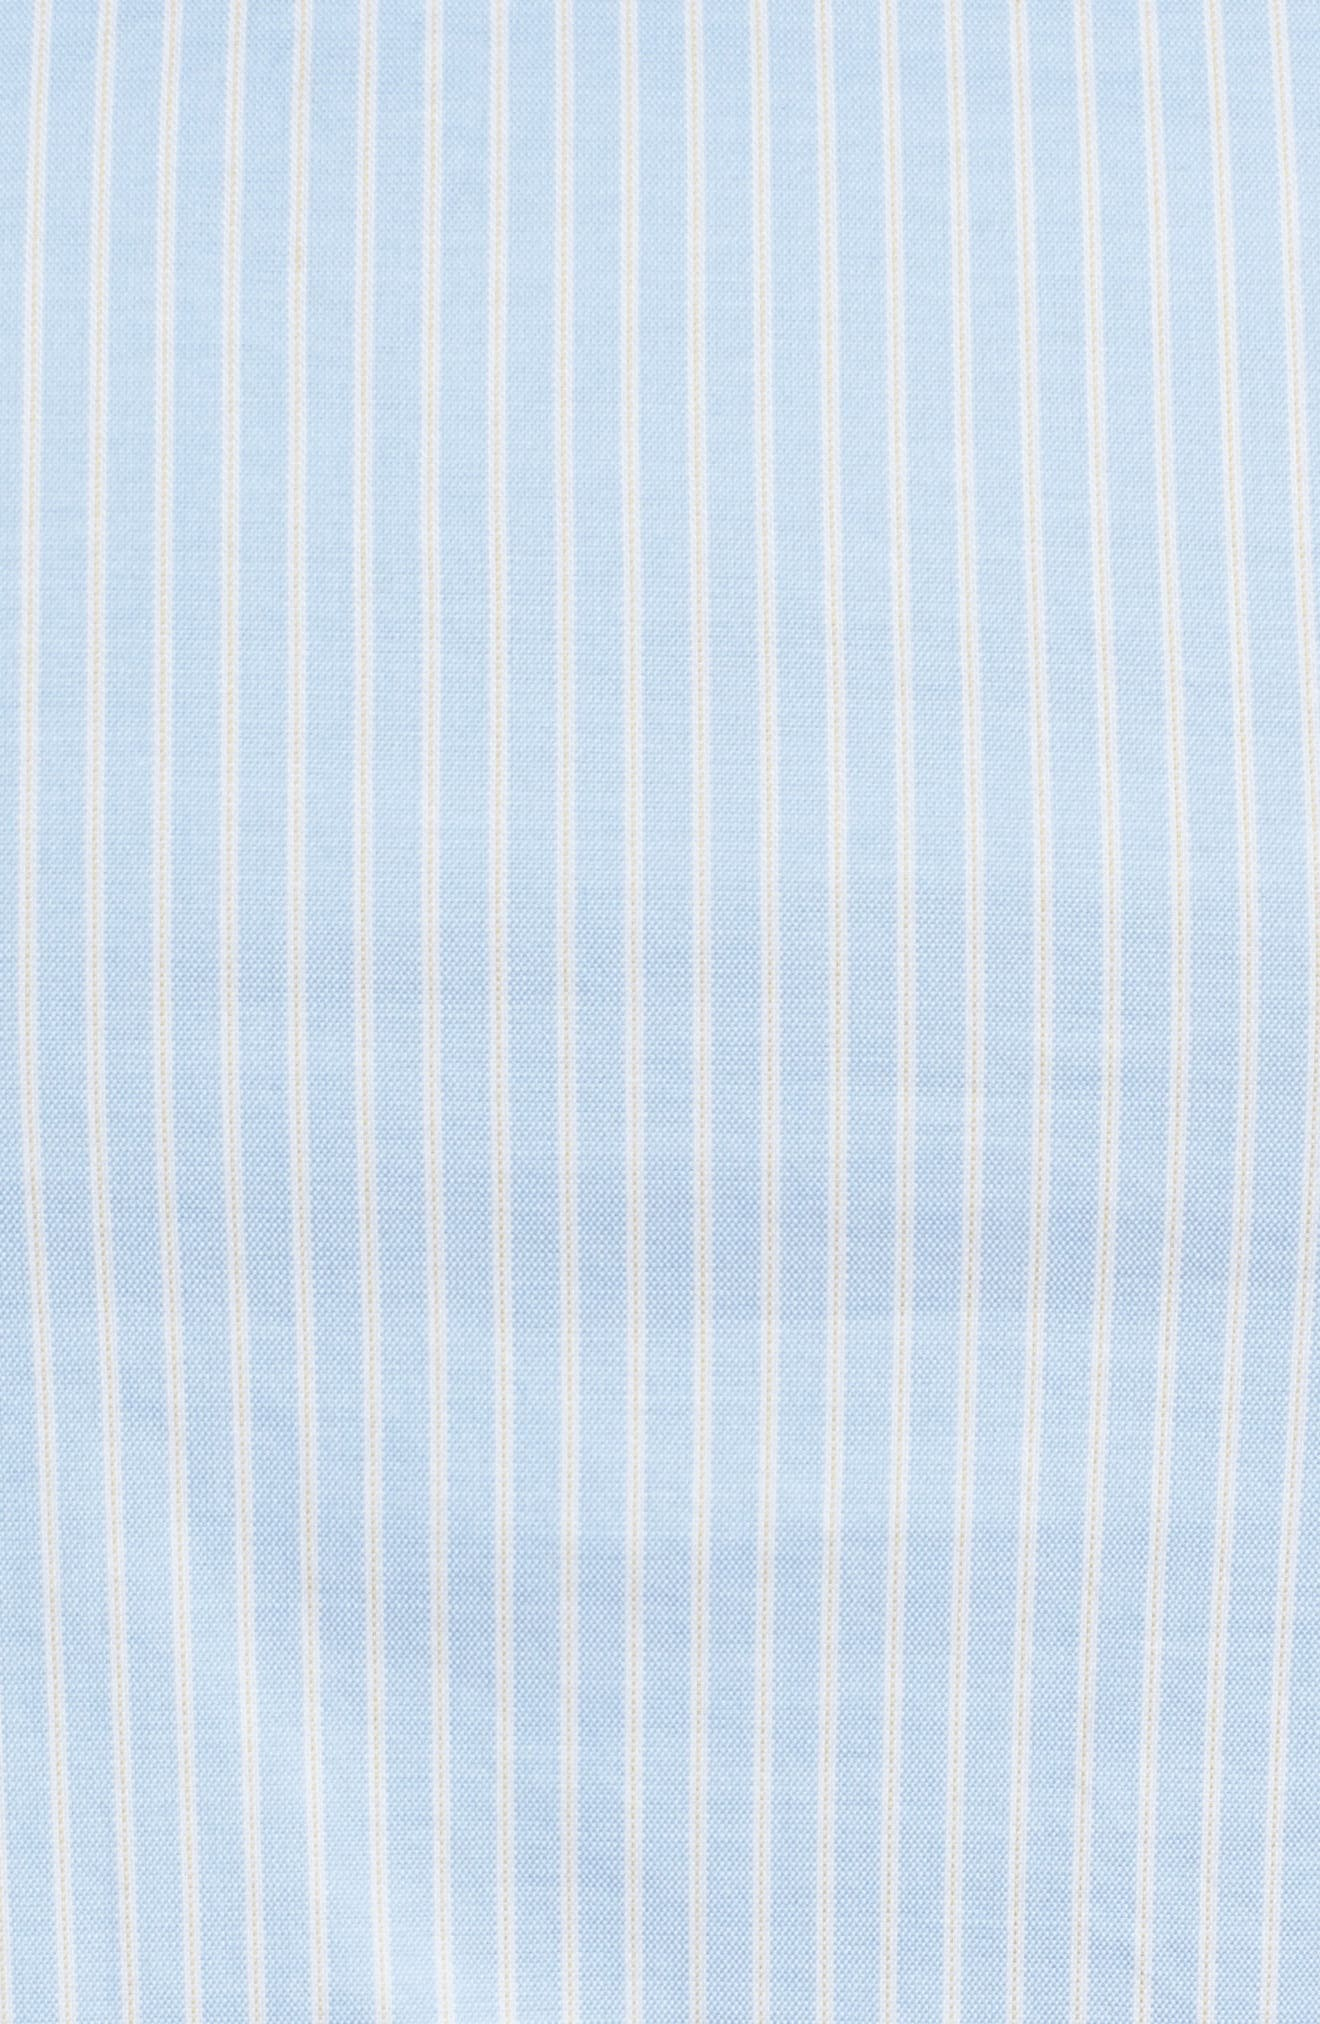 LACOSTE,                             Slim Fit Stripe Shirt,                             Alternate thumbnail 5, color,                             436